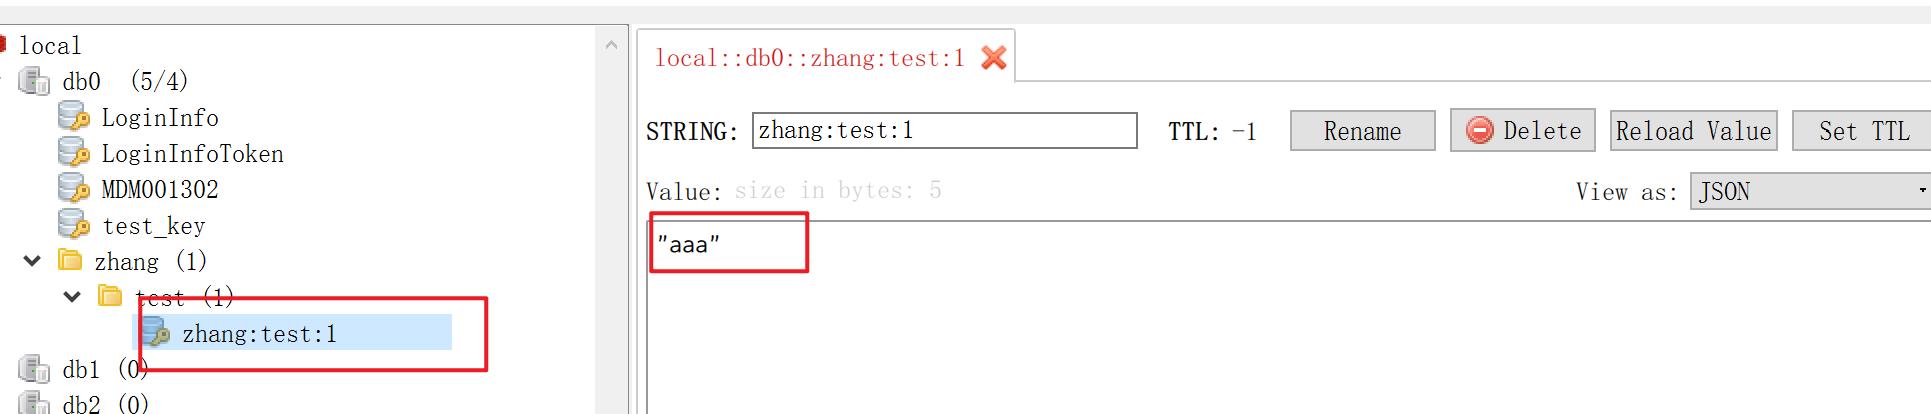 redis可视化工具显示存储结果